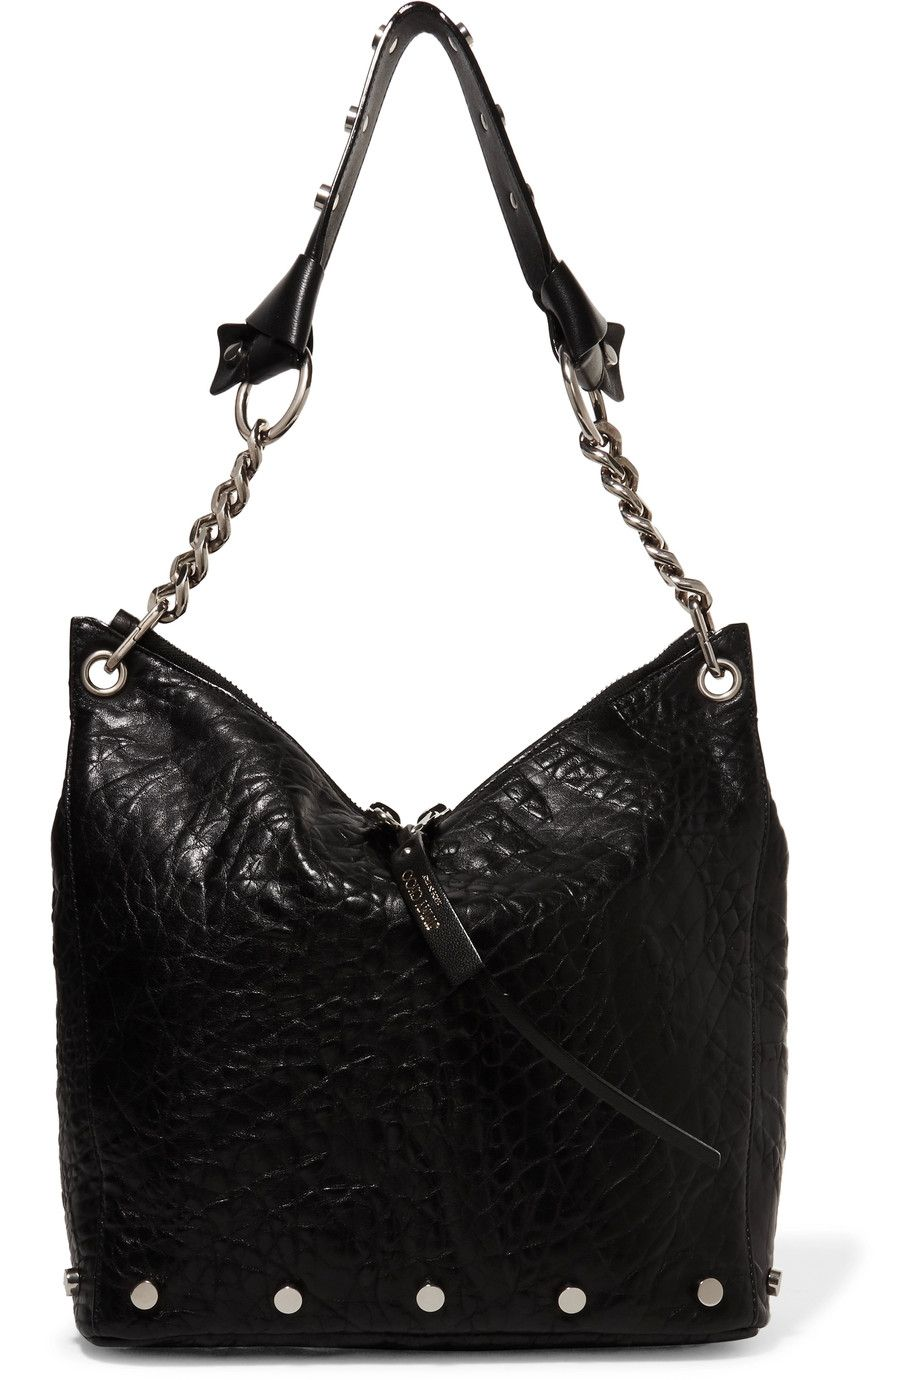 69f2f6330be0 JIMMY CHOO .  jimmychoo  bags  shoulder bags  hand bags  suede  tote ...